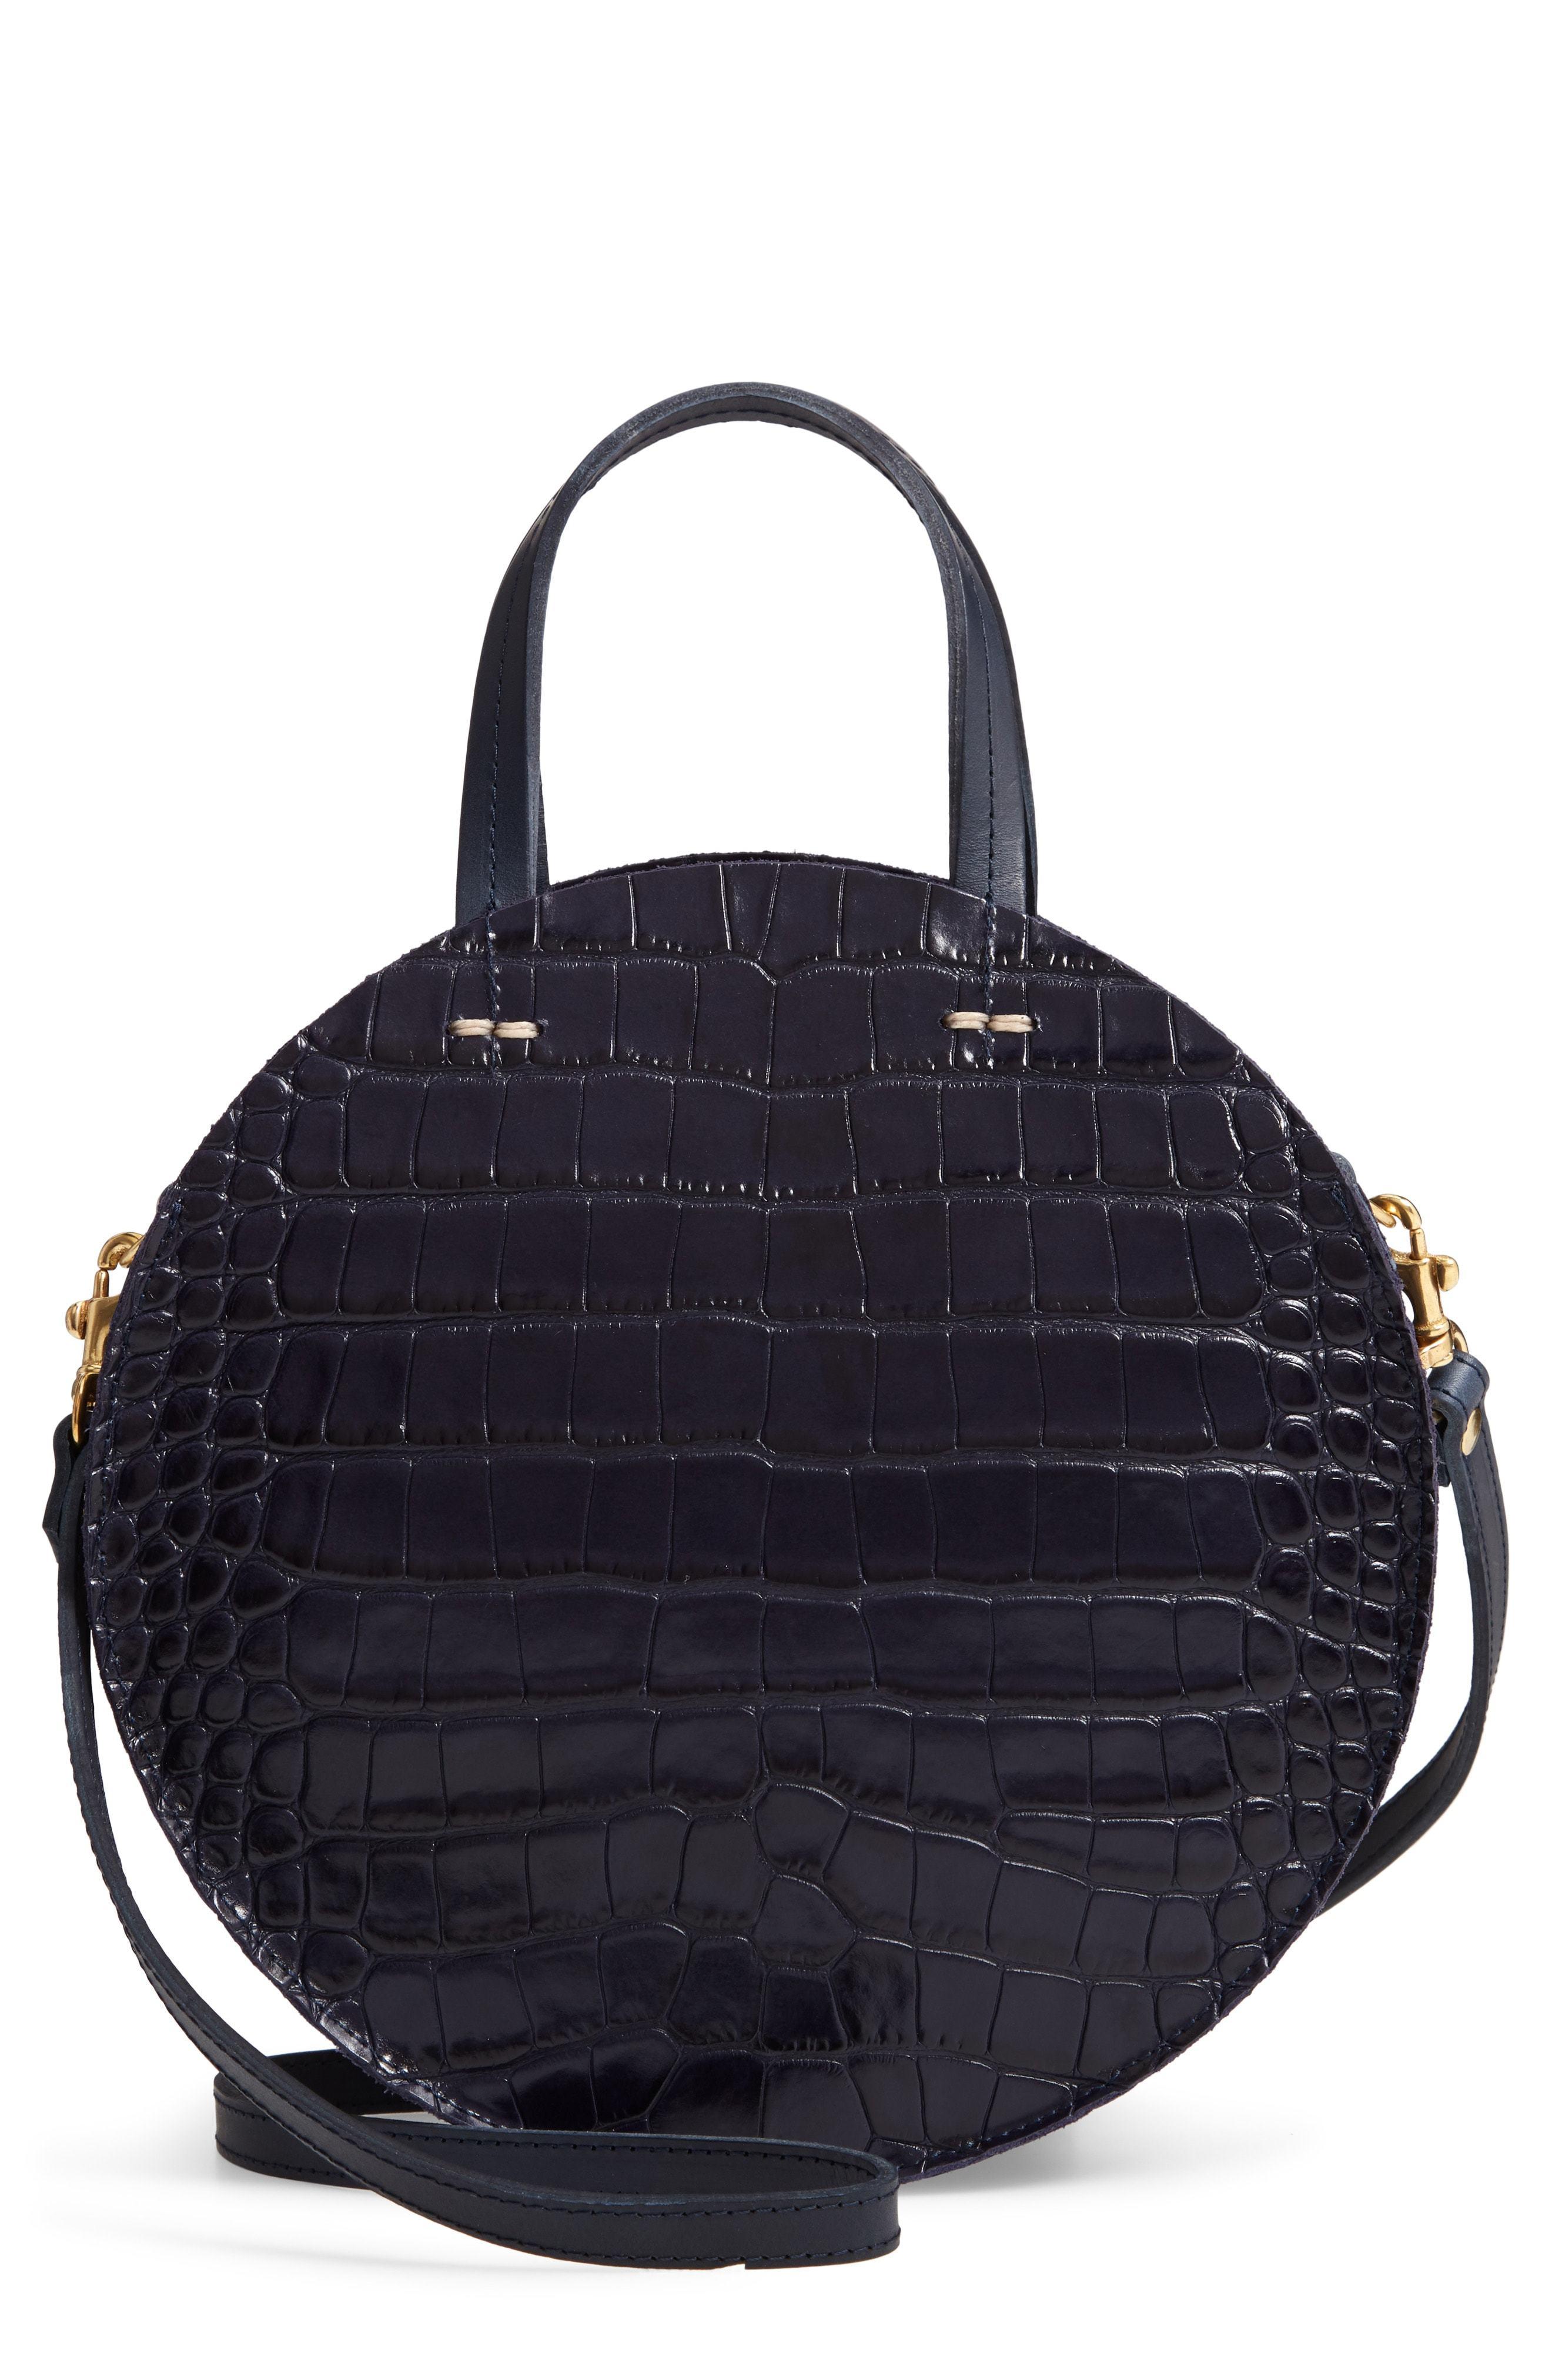 65eceec953e ... Clare V. Clare V Petit Alistair Croc Embossed Leather Circular  Crossbody Bag